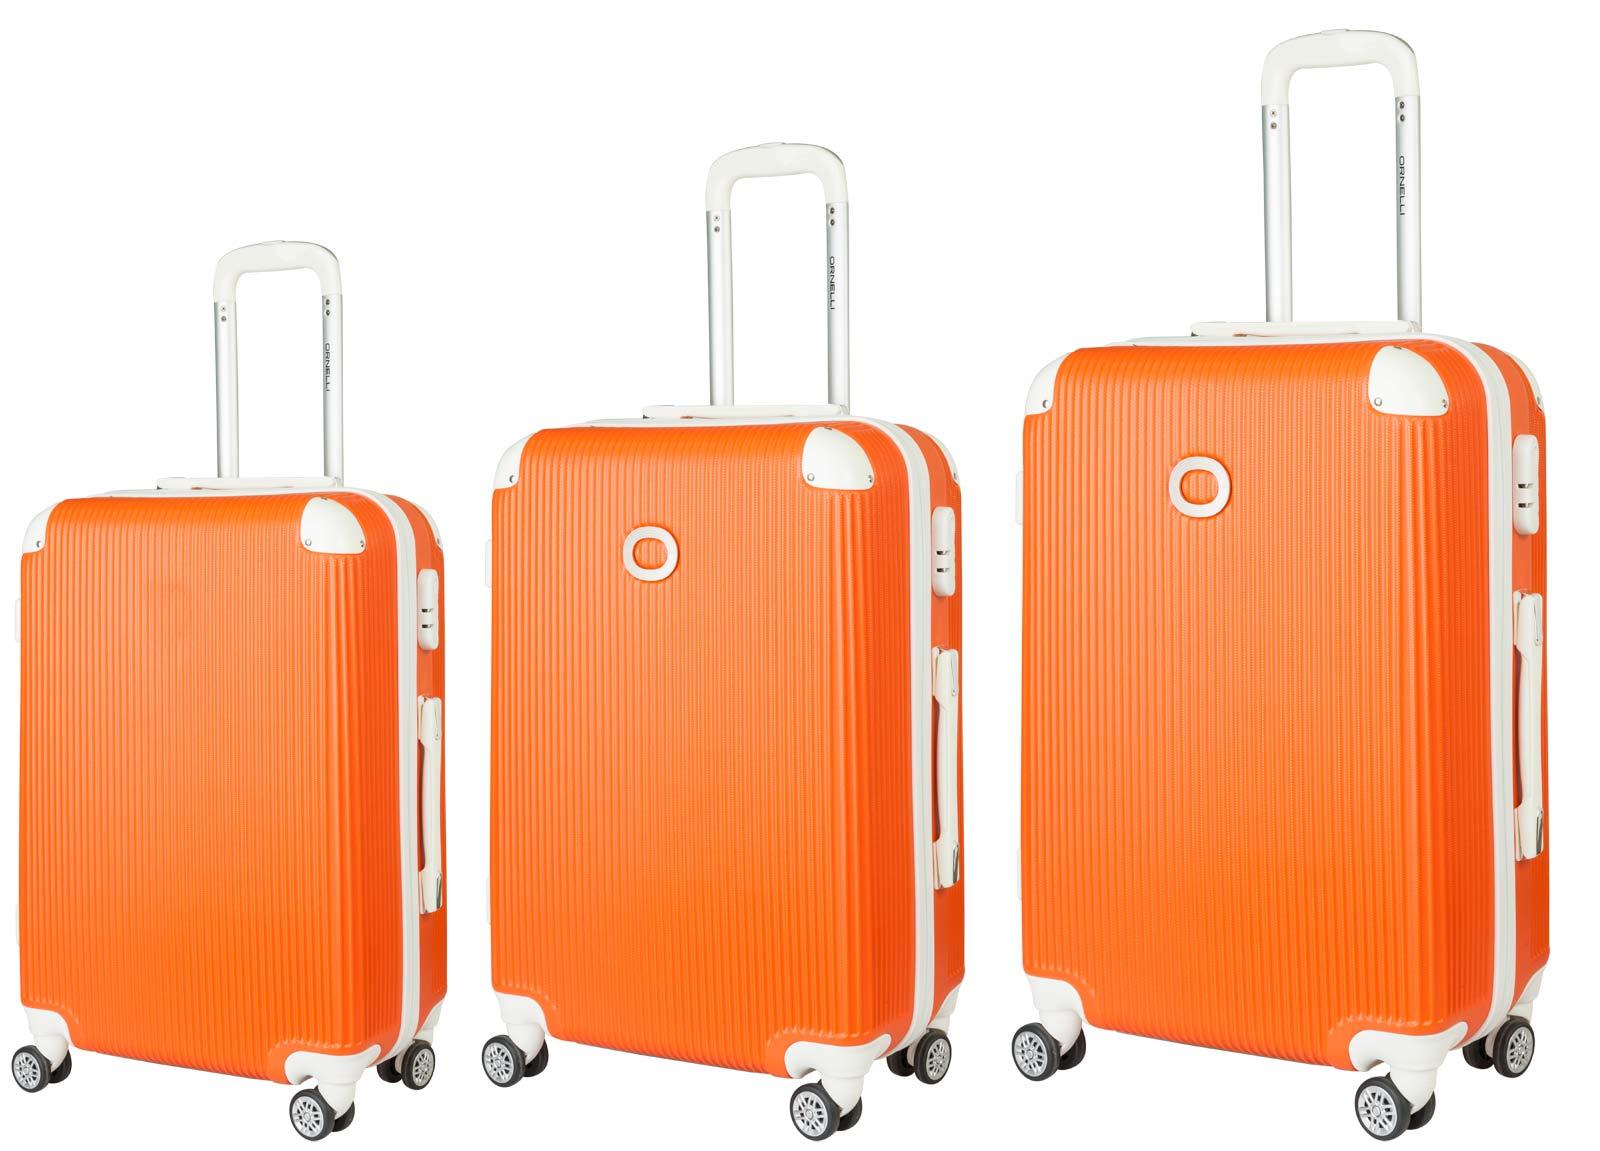 Чемодан Ornelli 3 в 1 , цвет: оранжевый, 21730 цена